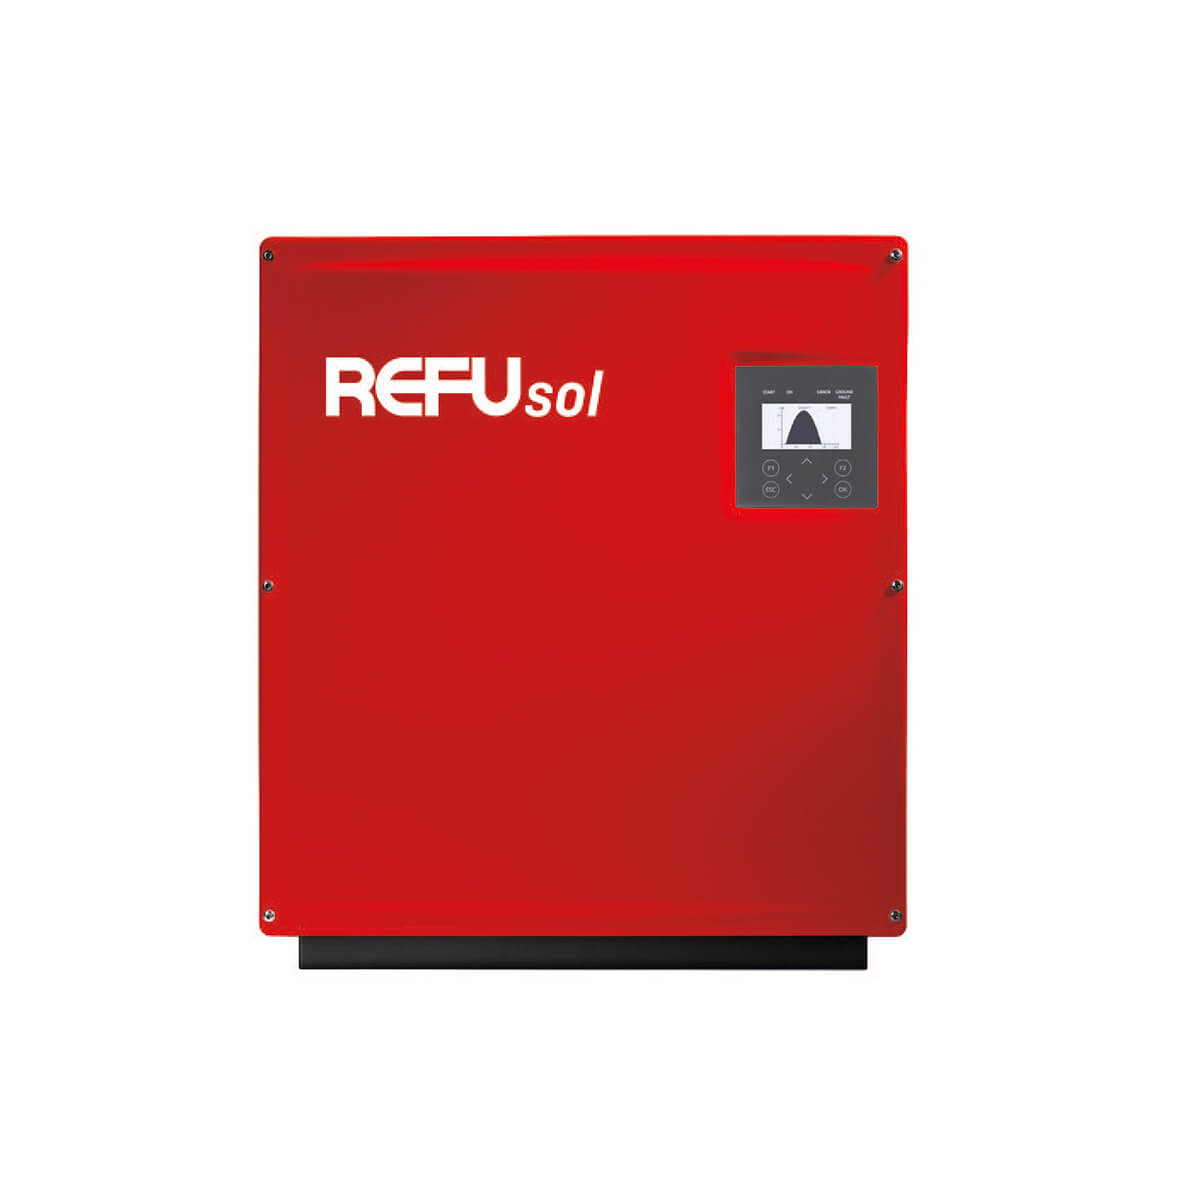 refusol 13kW inverter, refusol 13k 13kW inverter, refusol 13k inverter, refusol 13k, refusol 13k 13 kW, REFUSOL 13 KW